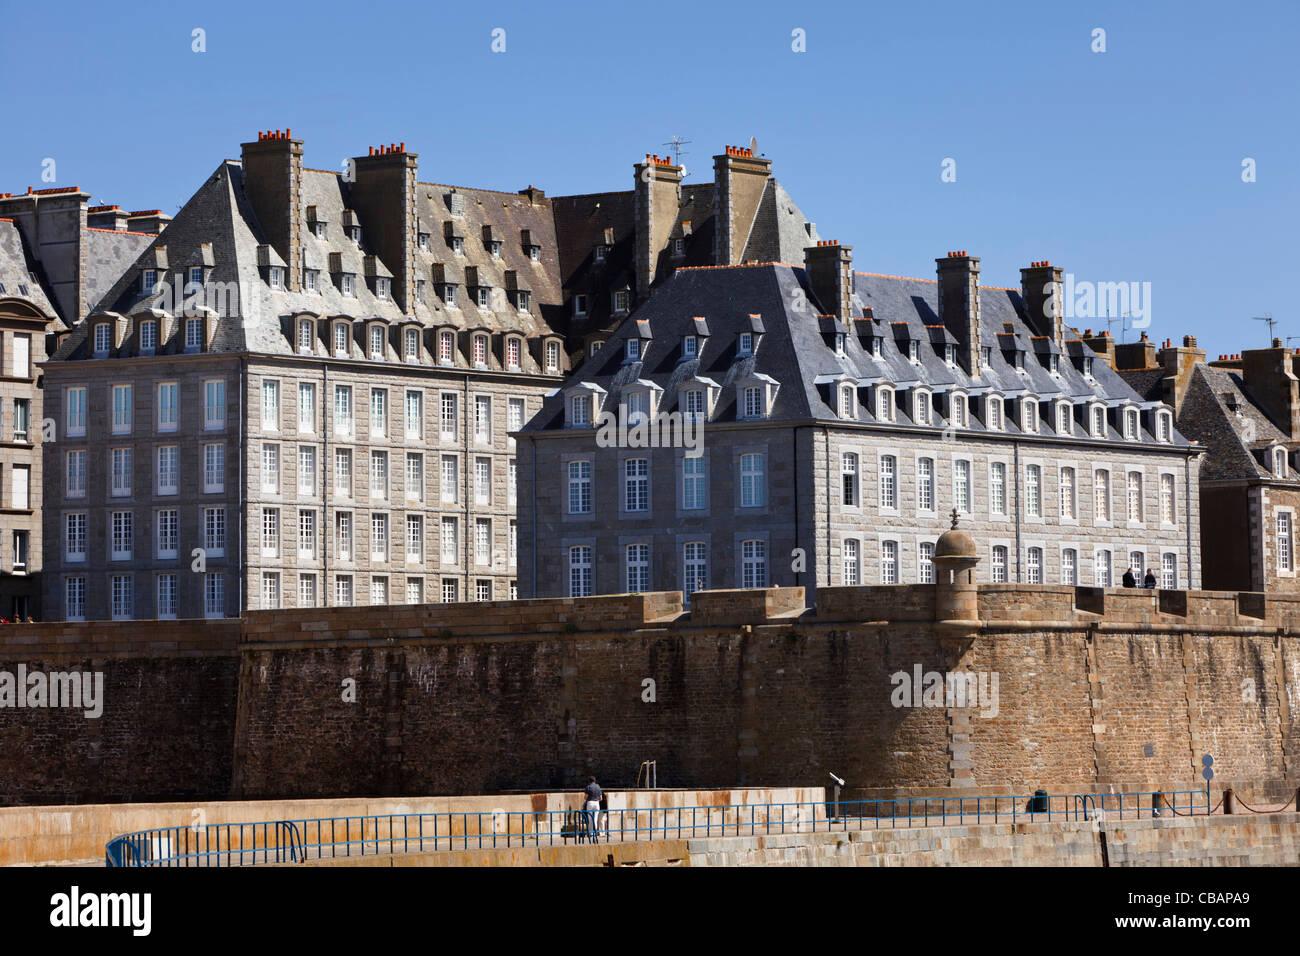 Saint Malo Or St Malo City Walls, Ille Et Vilaine, Brittany, France